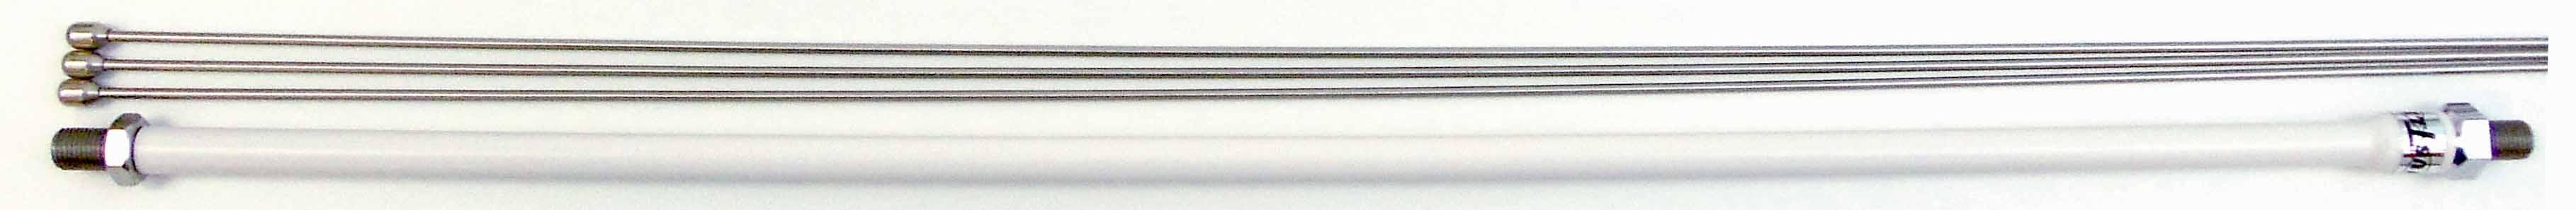 "MO4 - Hustler 20-1/2"" Stainless Antenna Mast W/White Coating & 3-25"" Rods"